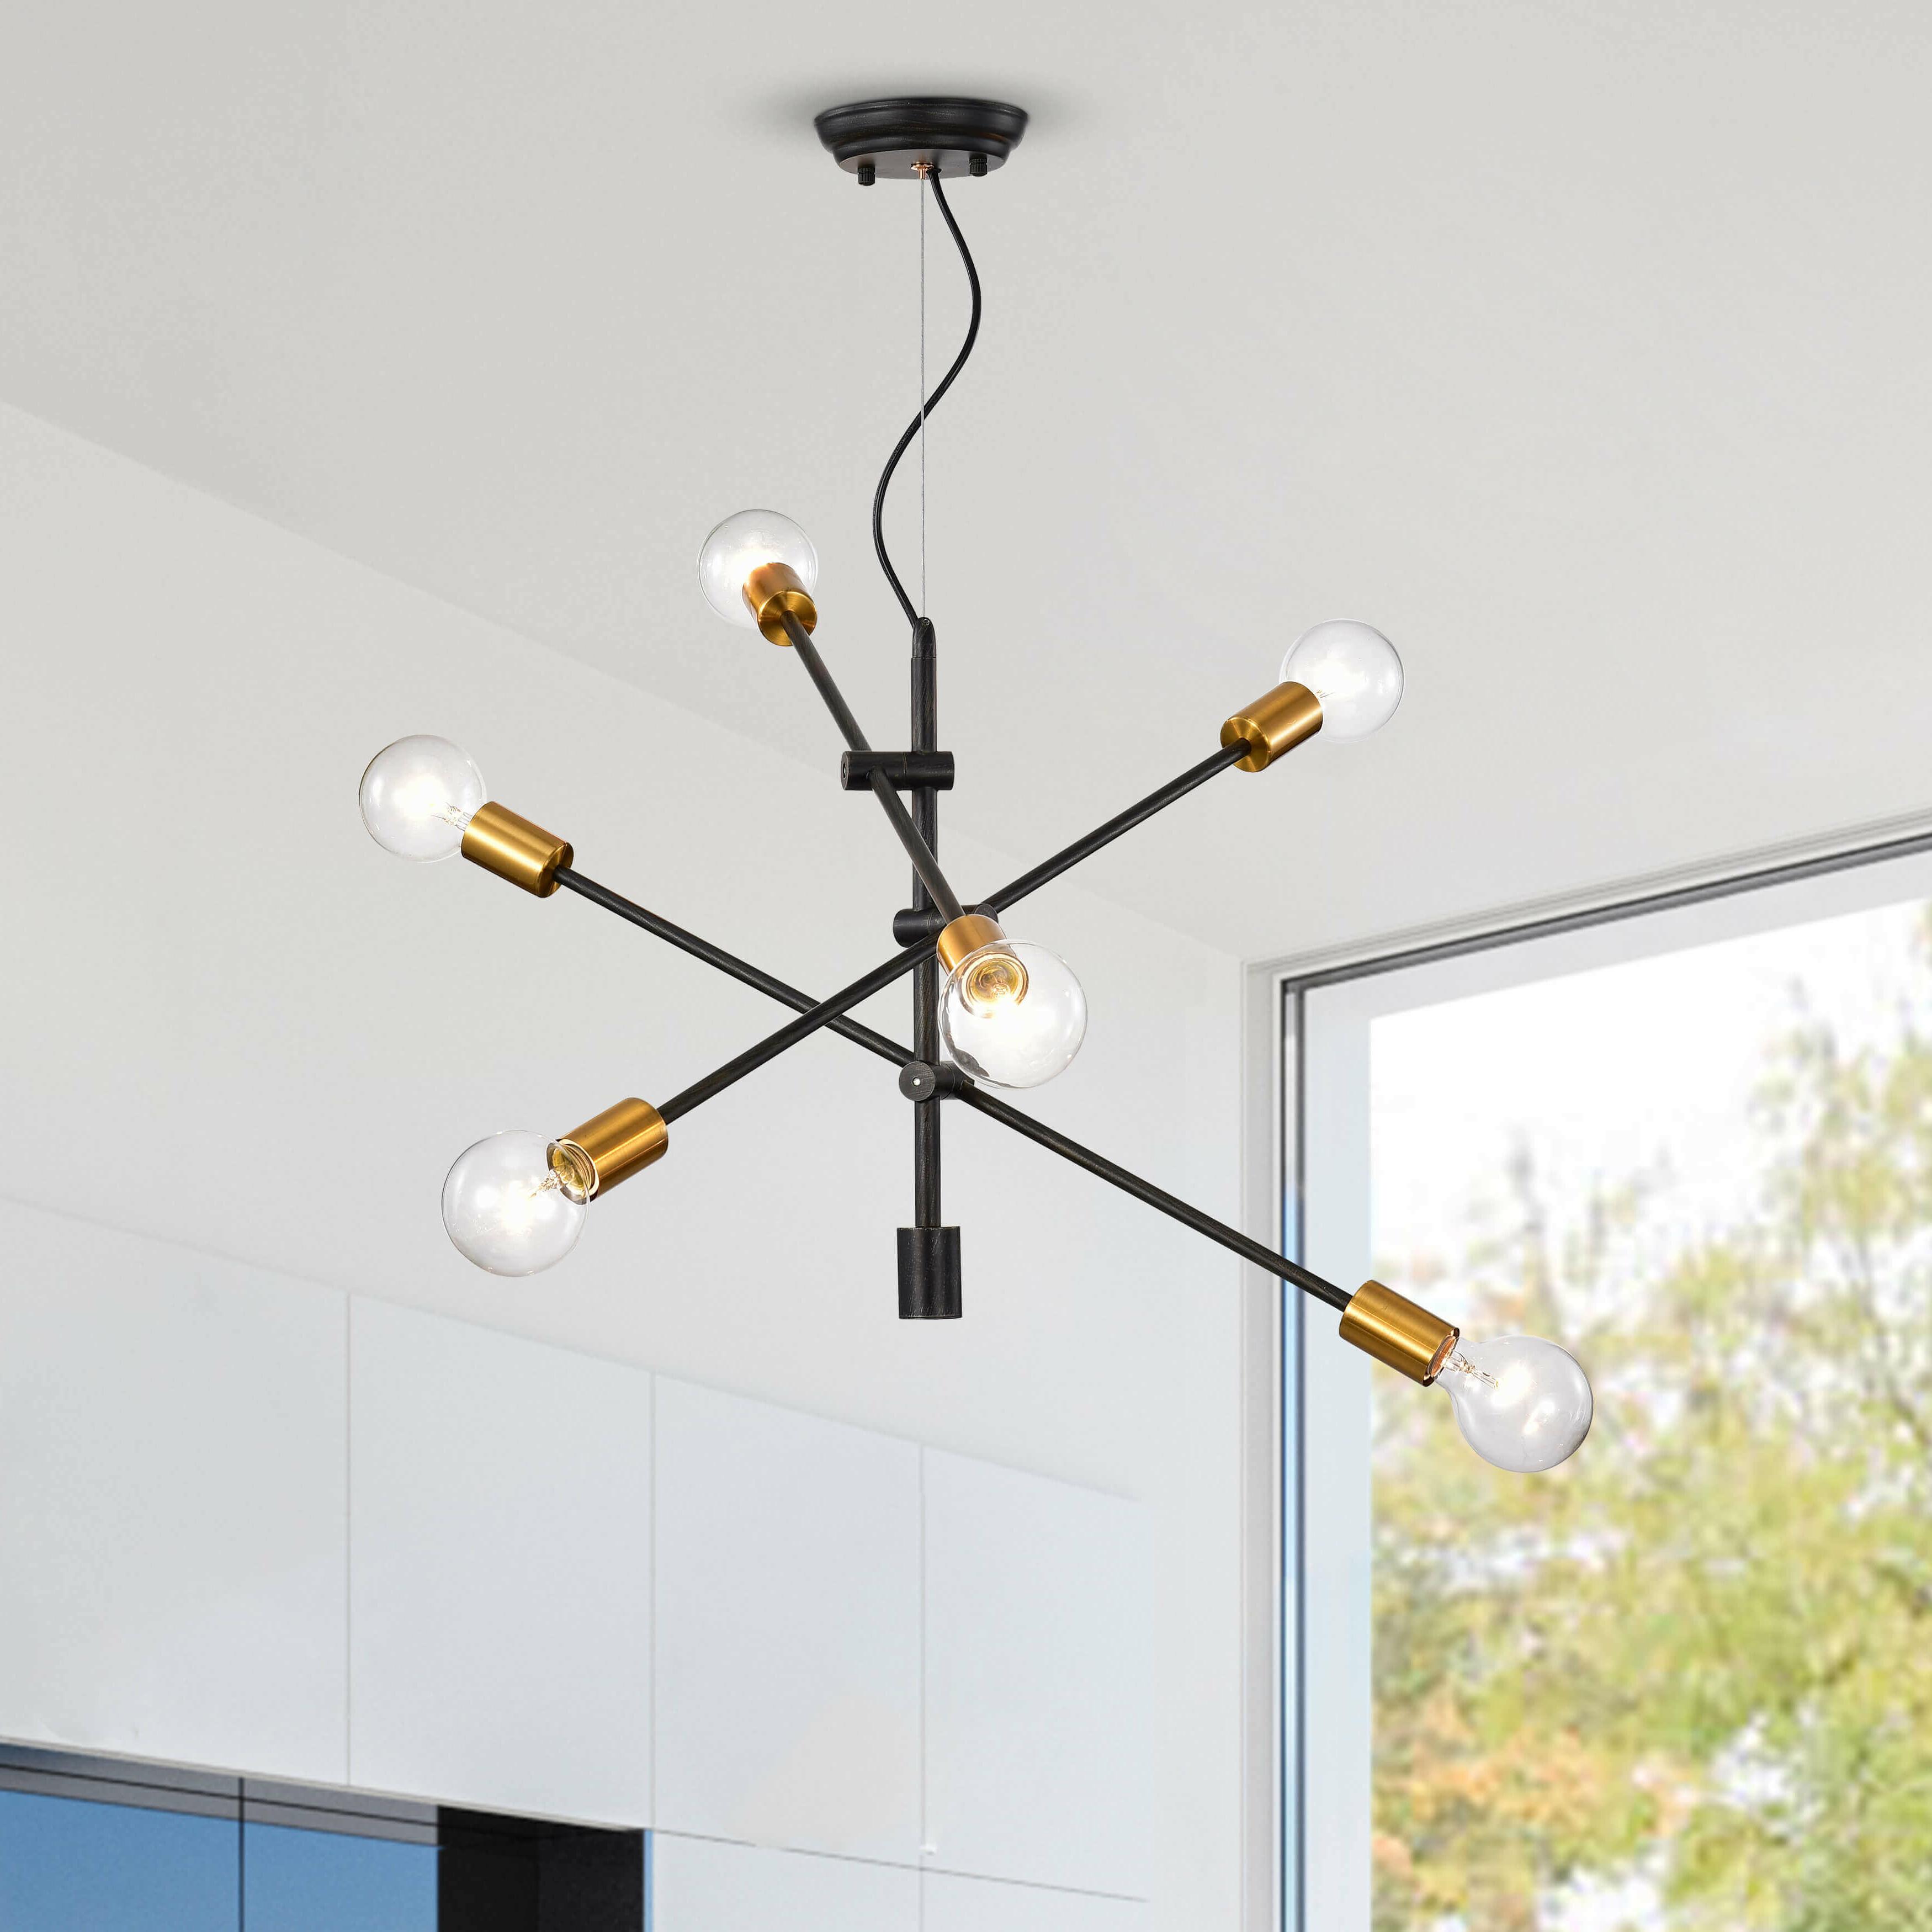 Johanne 6 Light Sputnik Chandeliers Intended For Popular Hillard 6 Light Sputnik Chandelier (View 11 of 25)